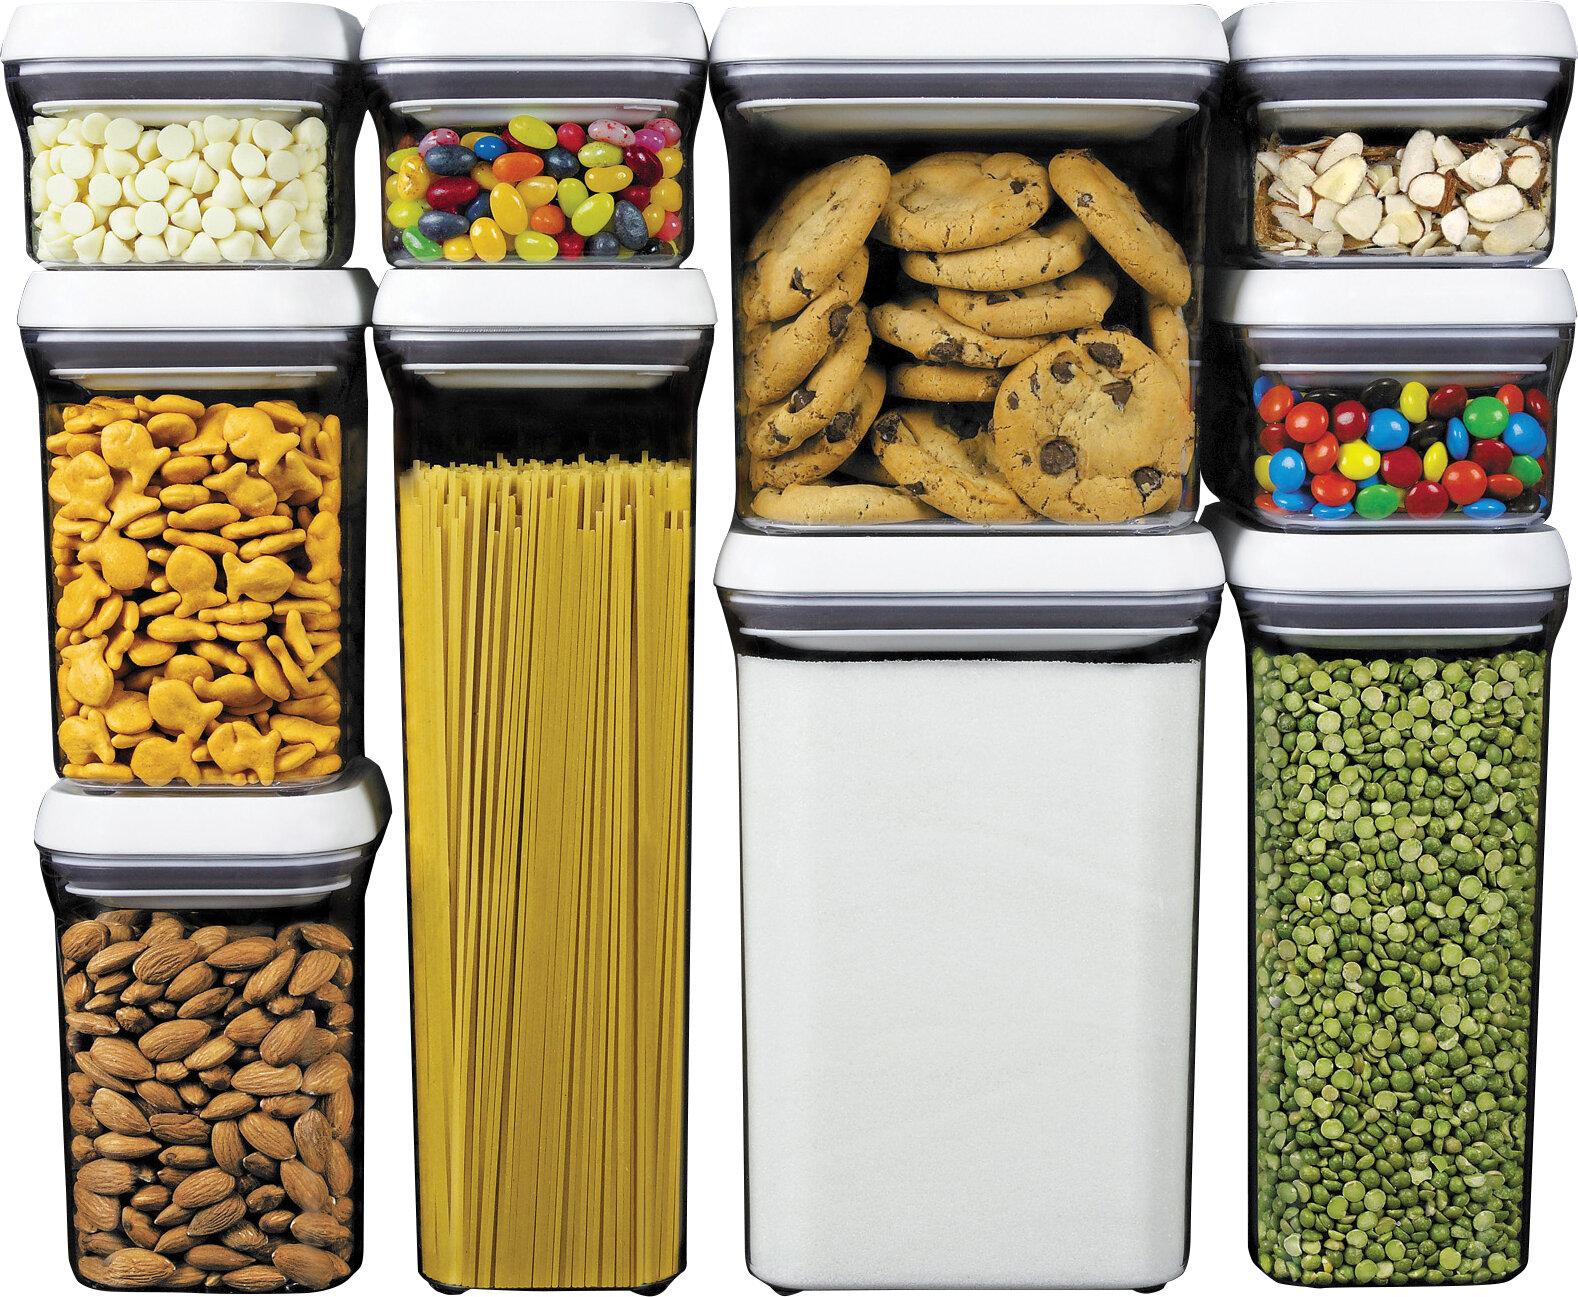 & OXO Good Grips Pop 10 Container Food Storage Set u0026 Reviews | Wayfair